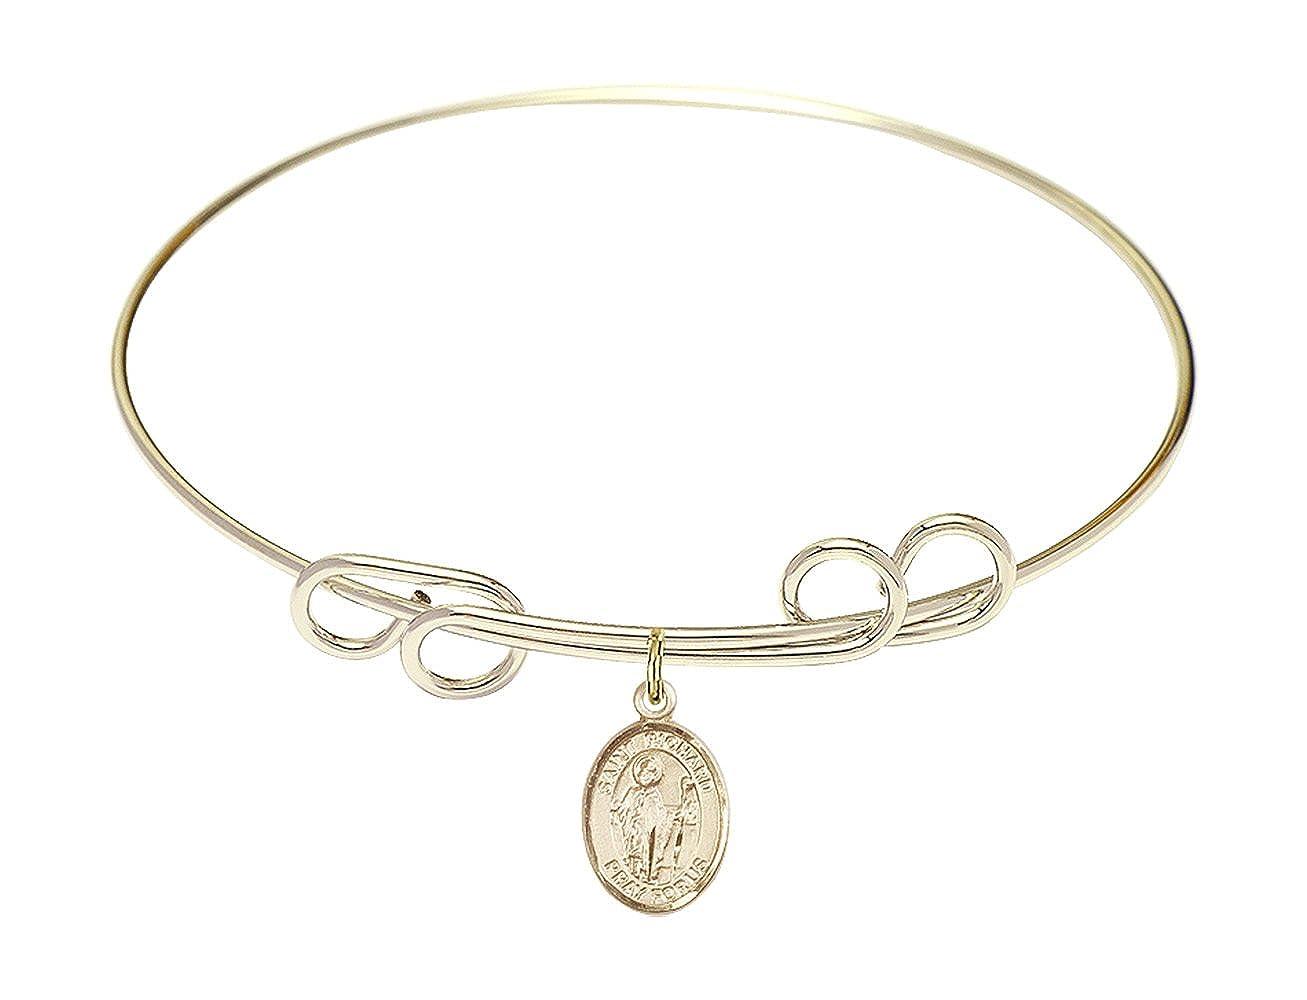 DiamondJewelryNY Double Loop Bangle Bracelet with a St Richard Charm.